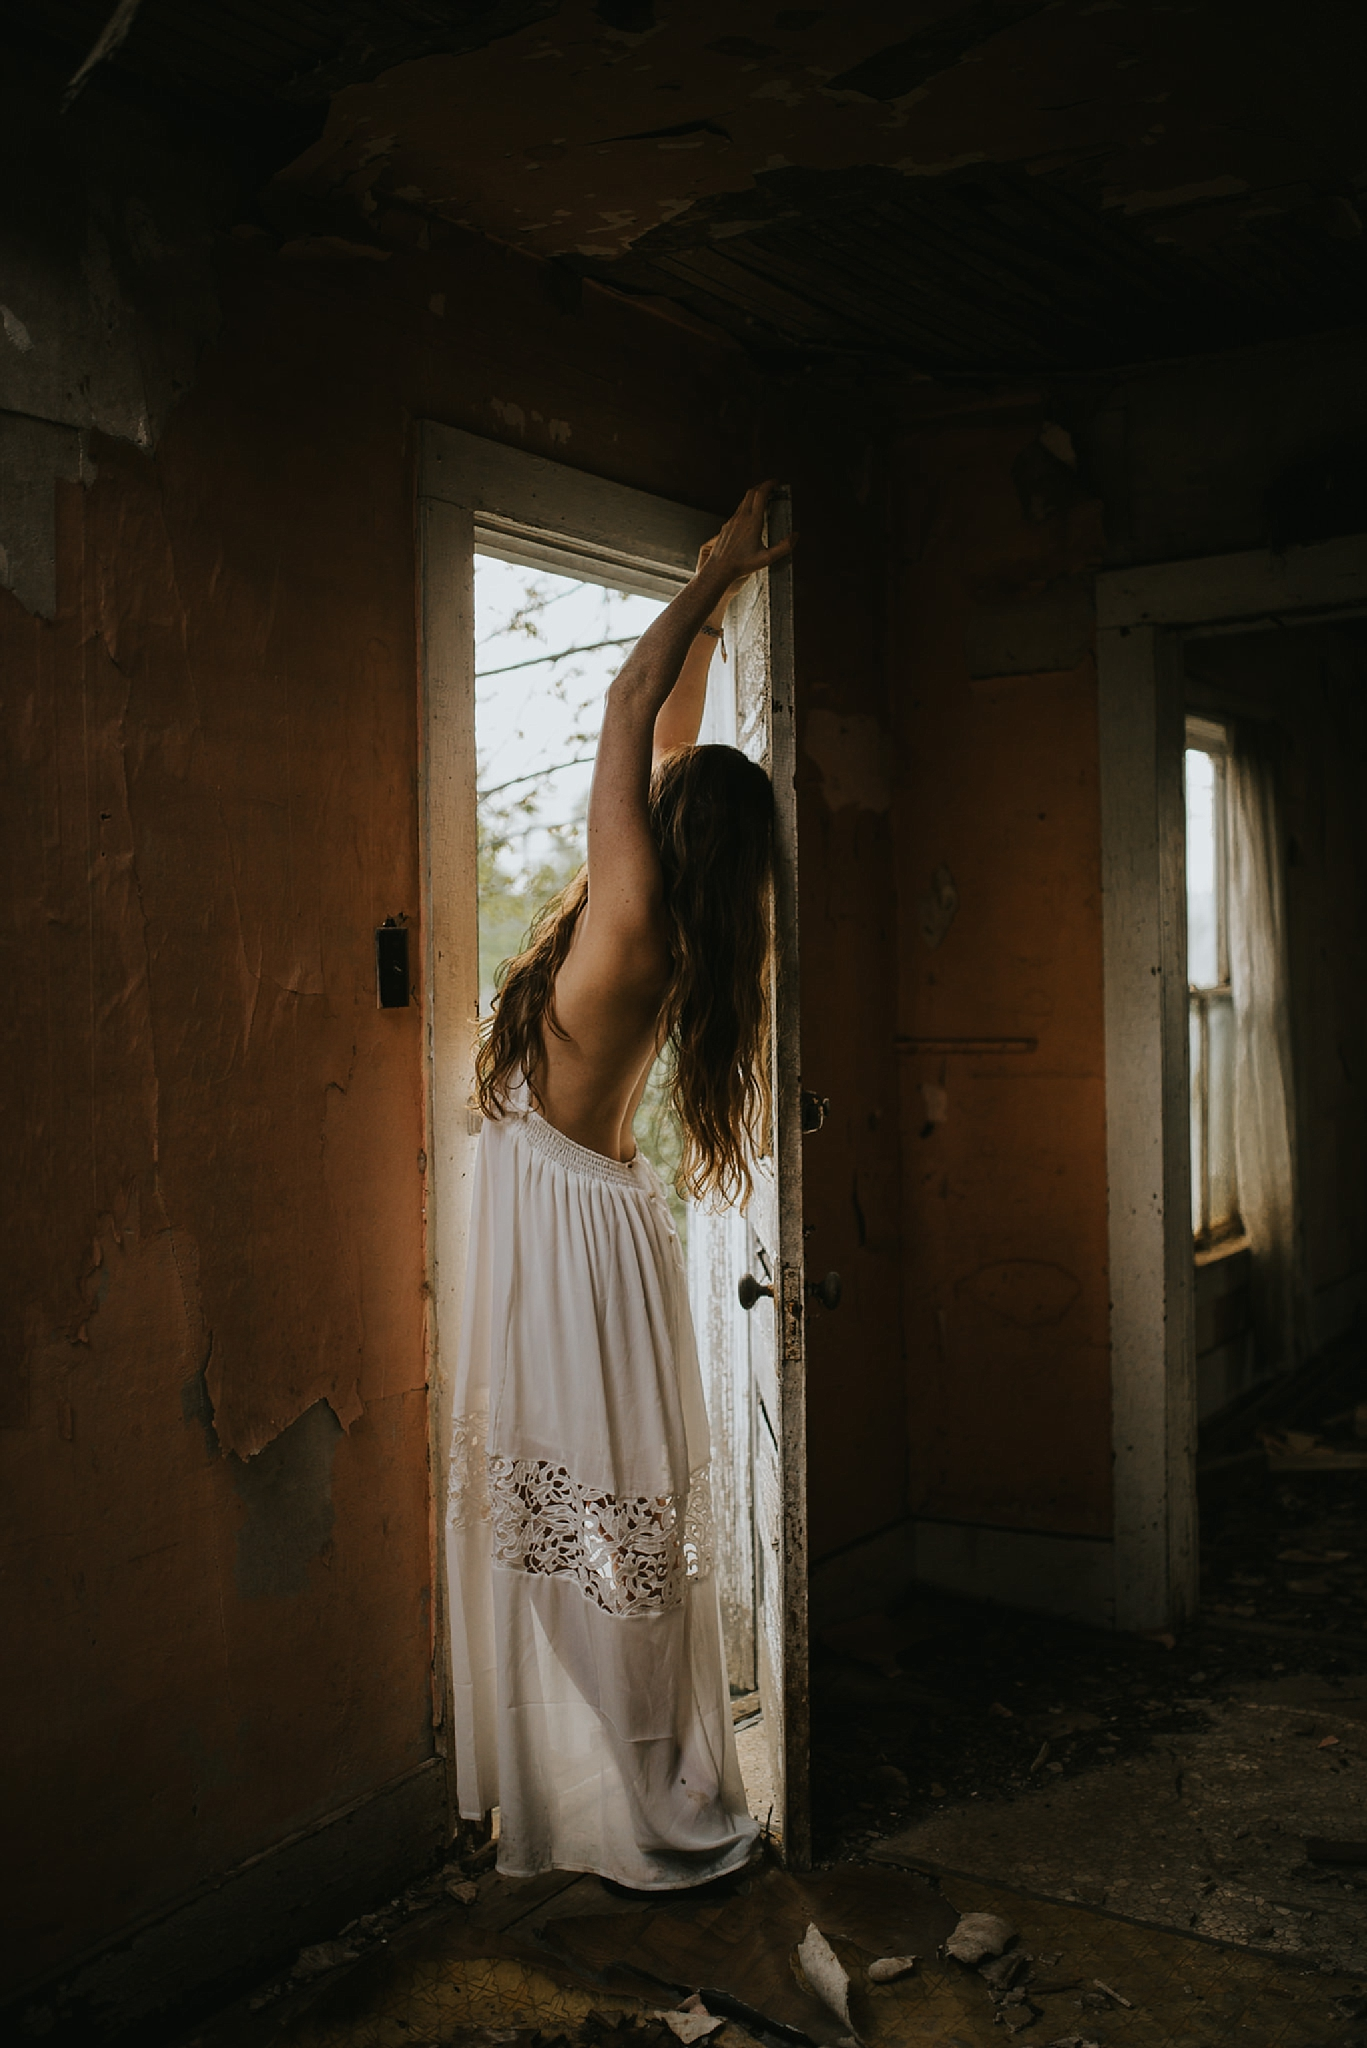 twyla jones photography - west palm beach florida photographer - boudoir in an old house-4925_treasure coast florida.jpg